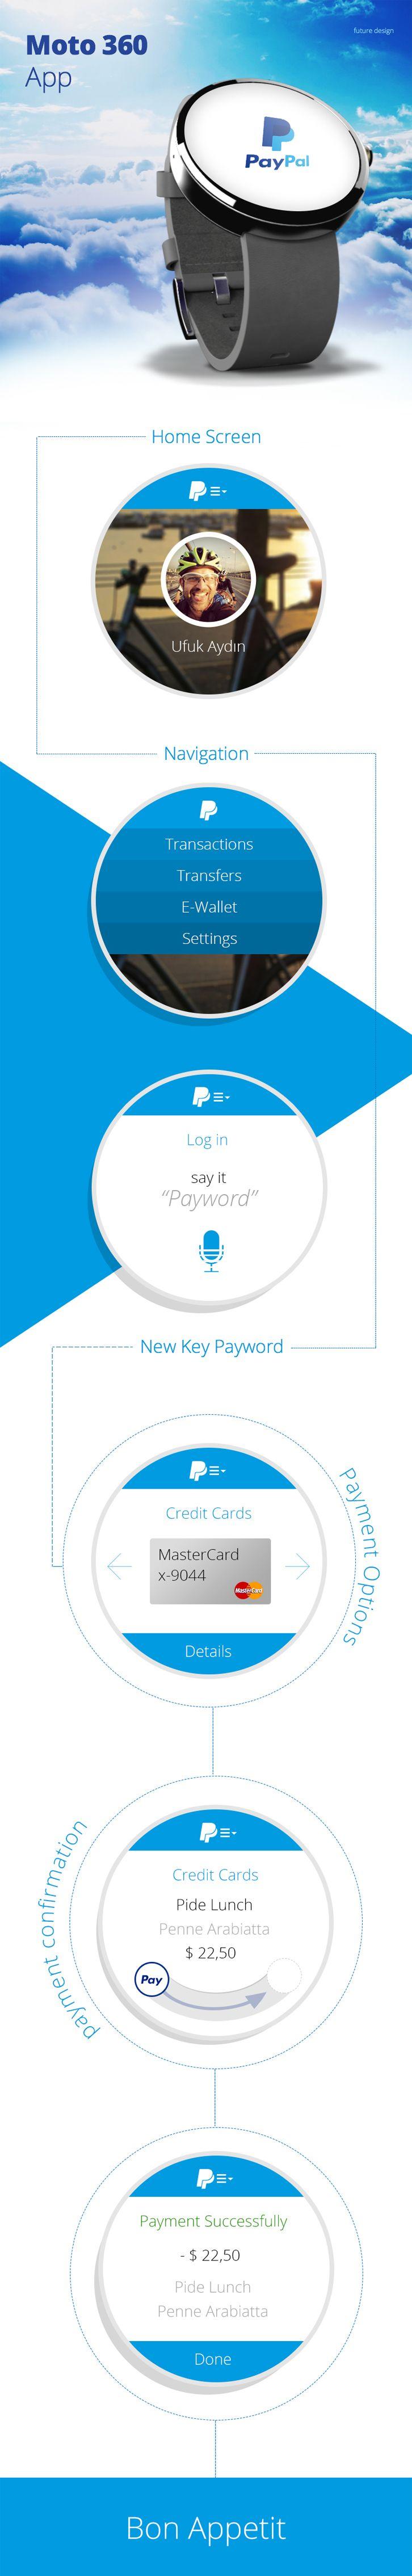 Paypal Moto 360 App Concept